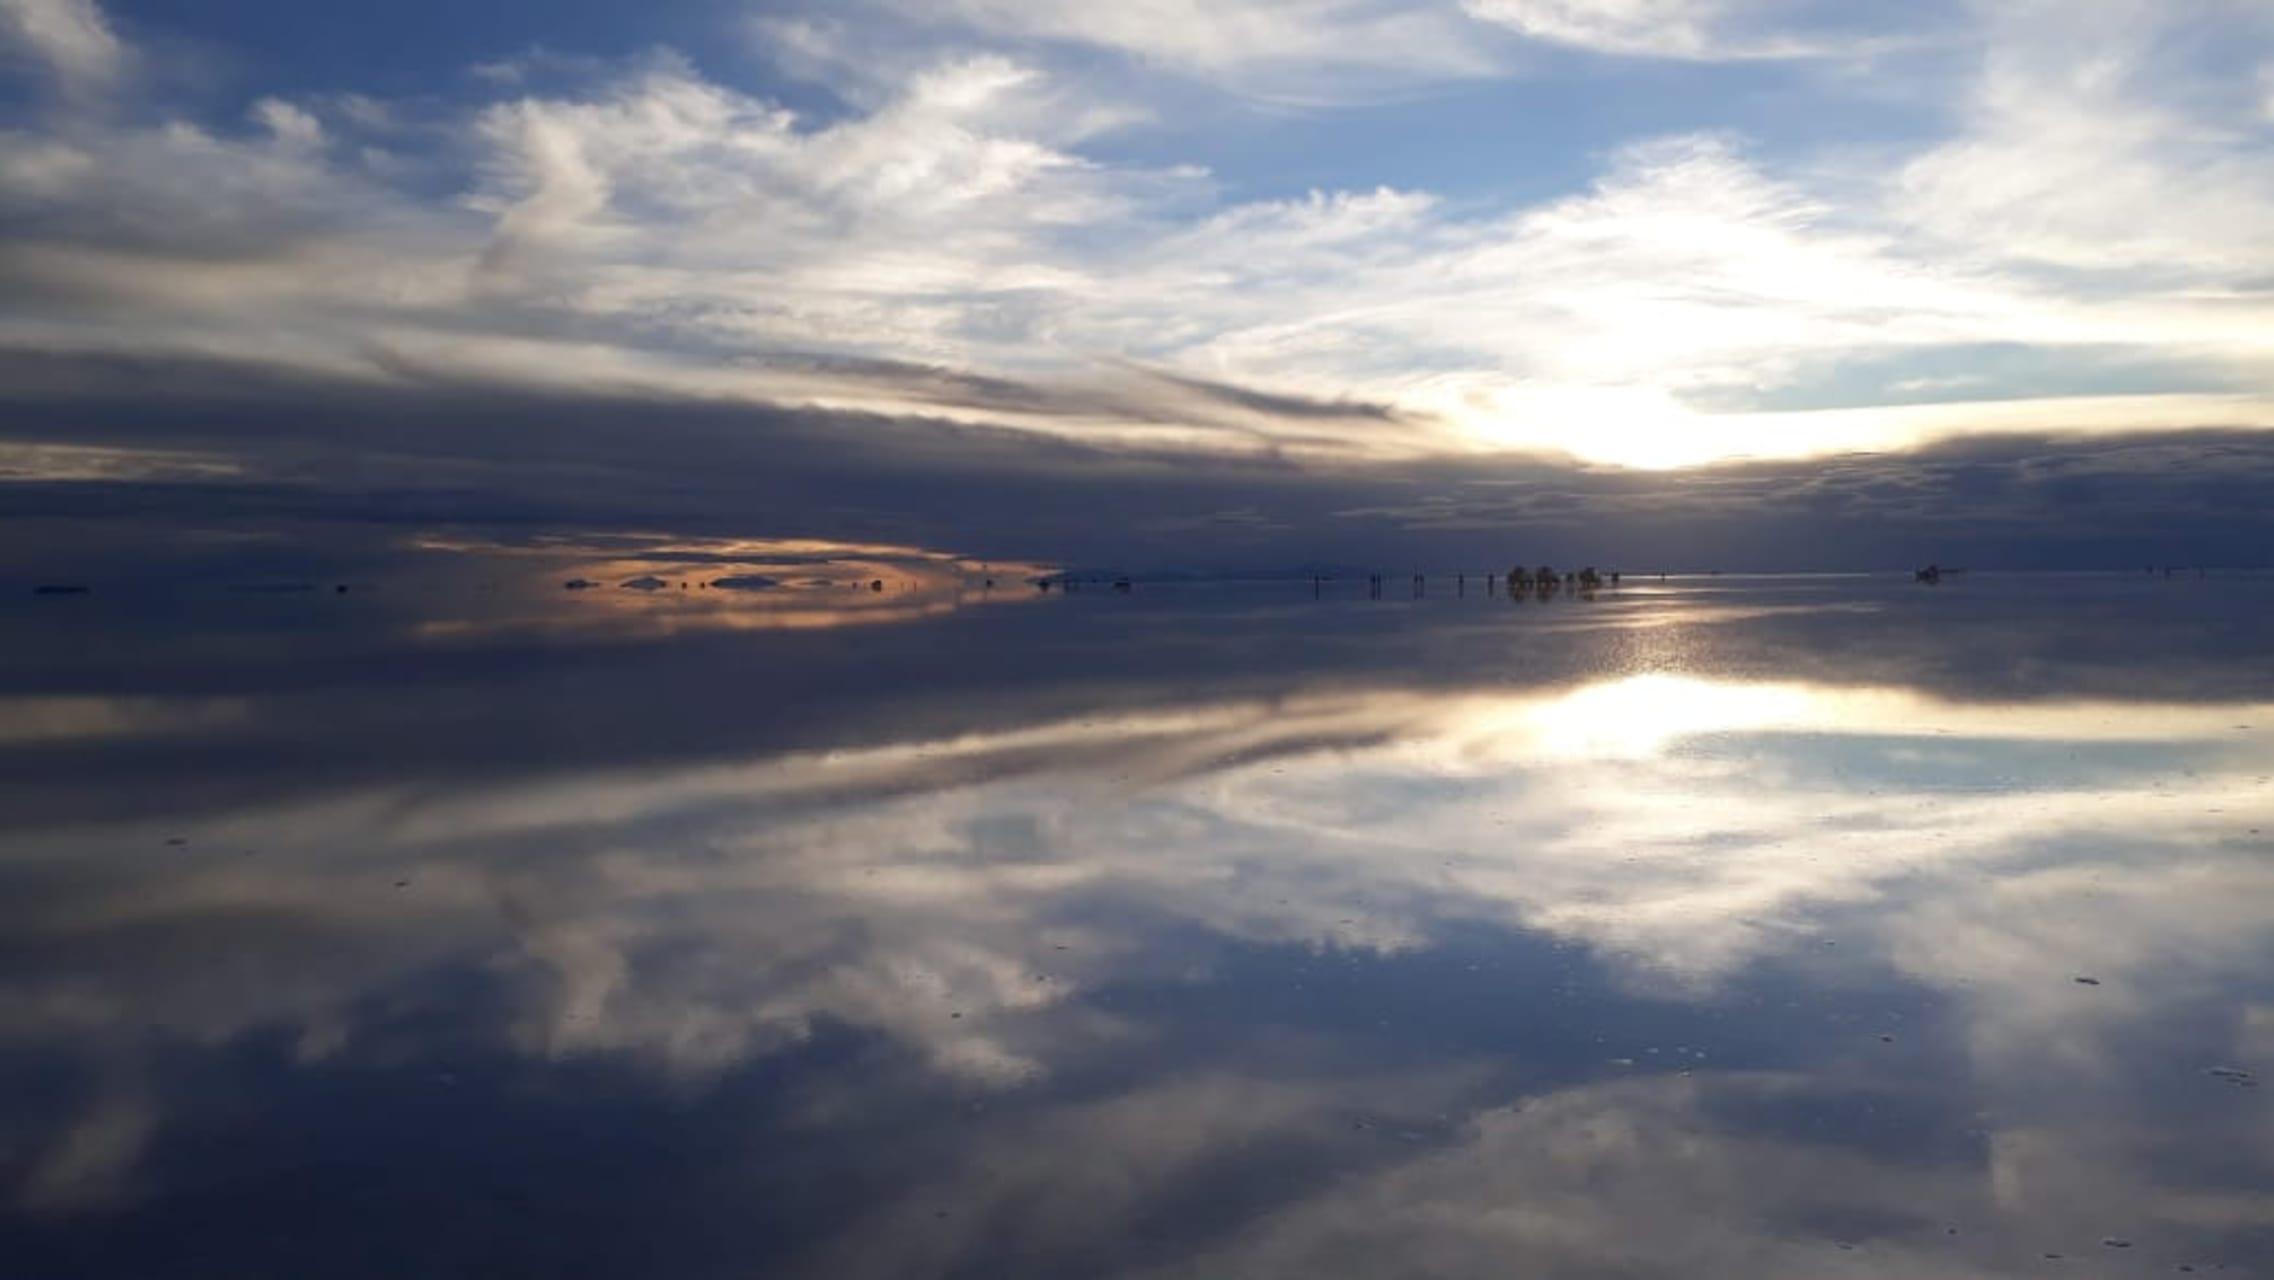 La Paz - Salt Flat: Largest Salt Reserve in the World